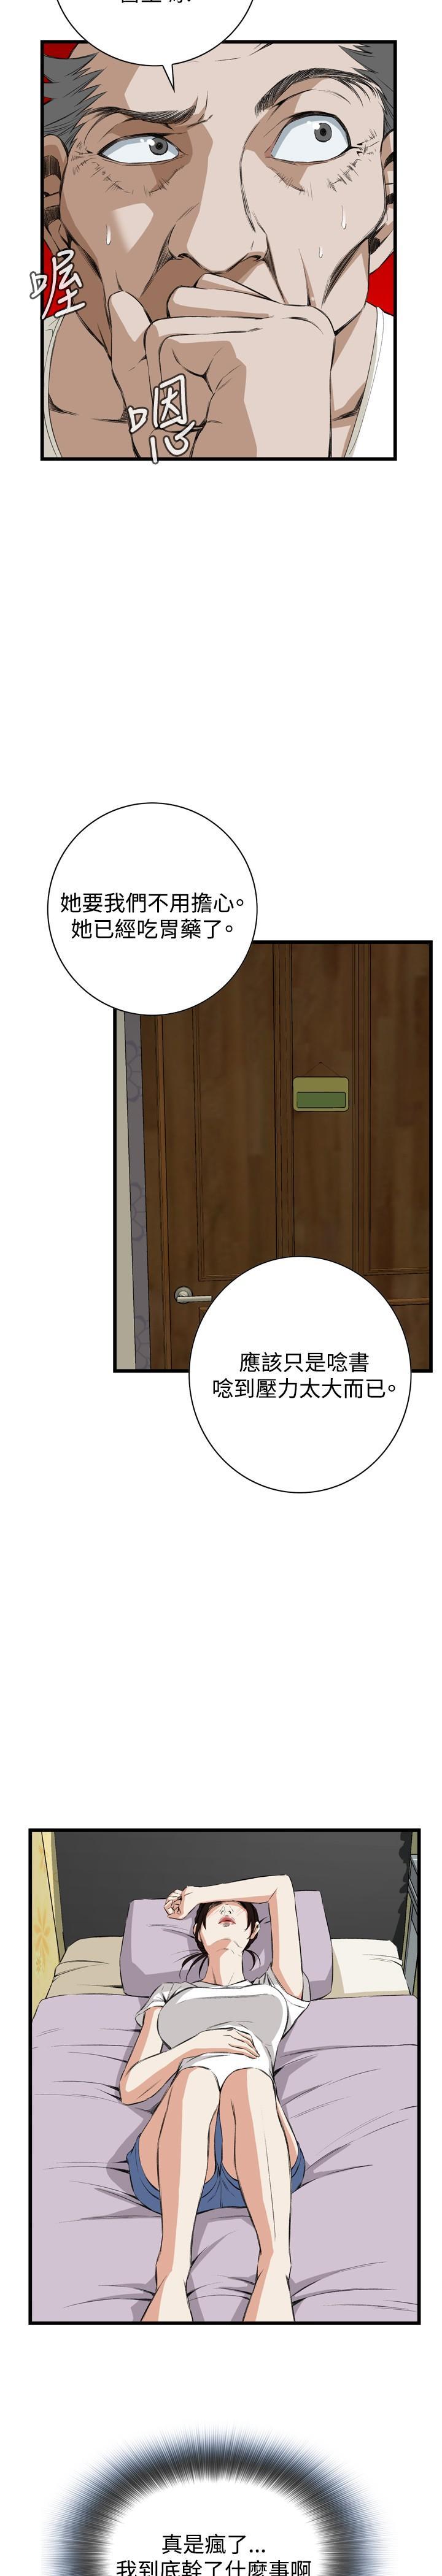 Take a Peek 偷窥 Ch.39~55 [Chinese]中文 385